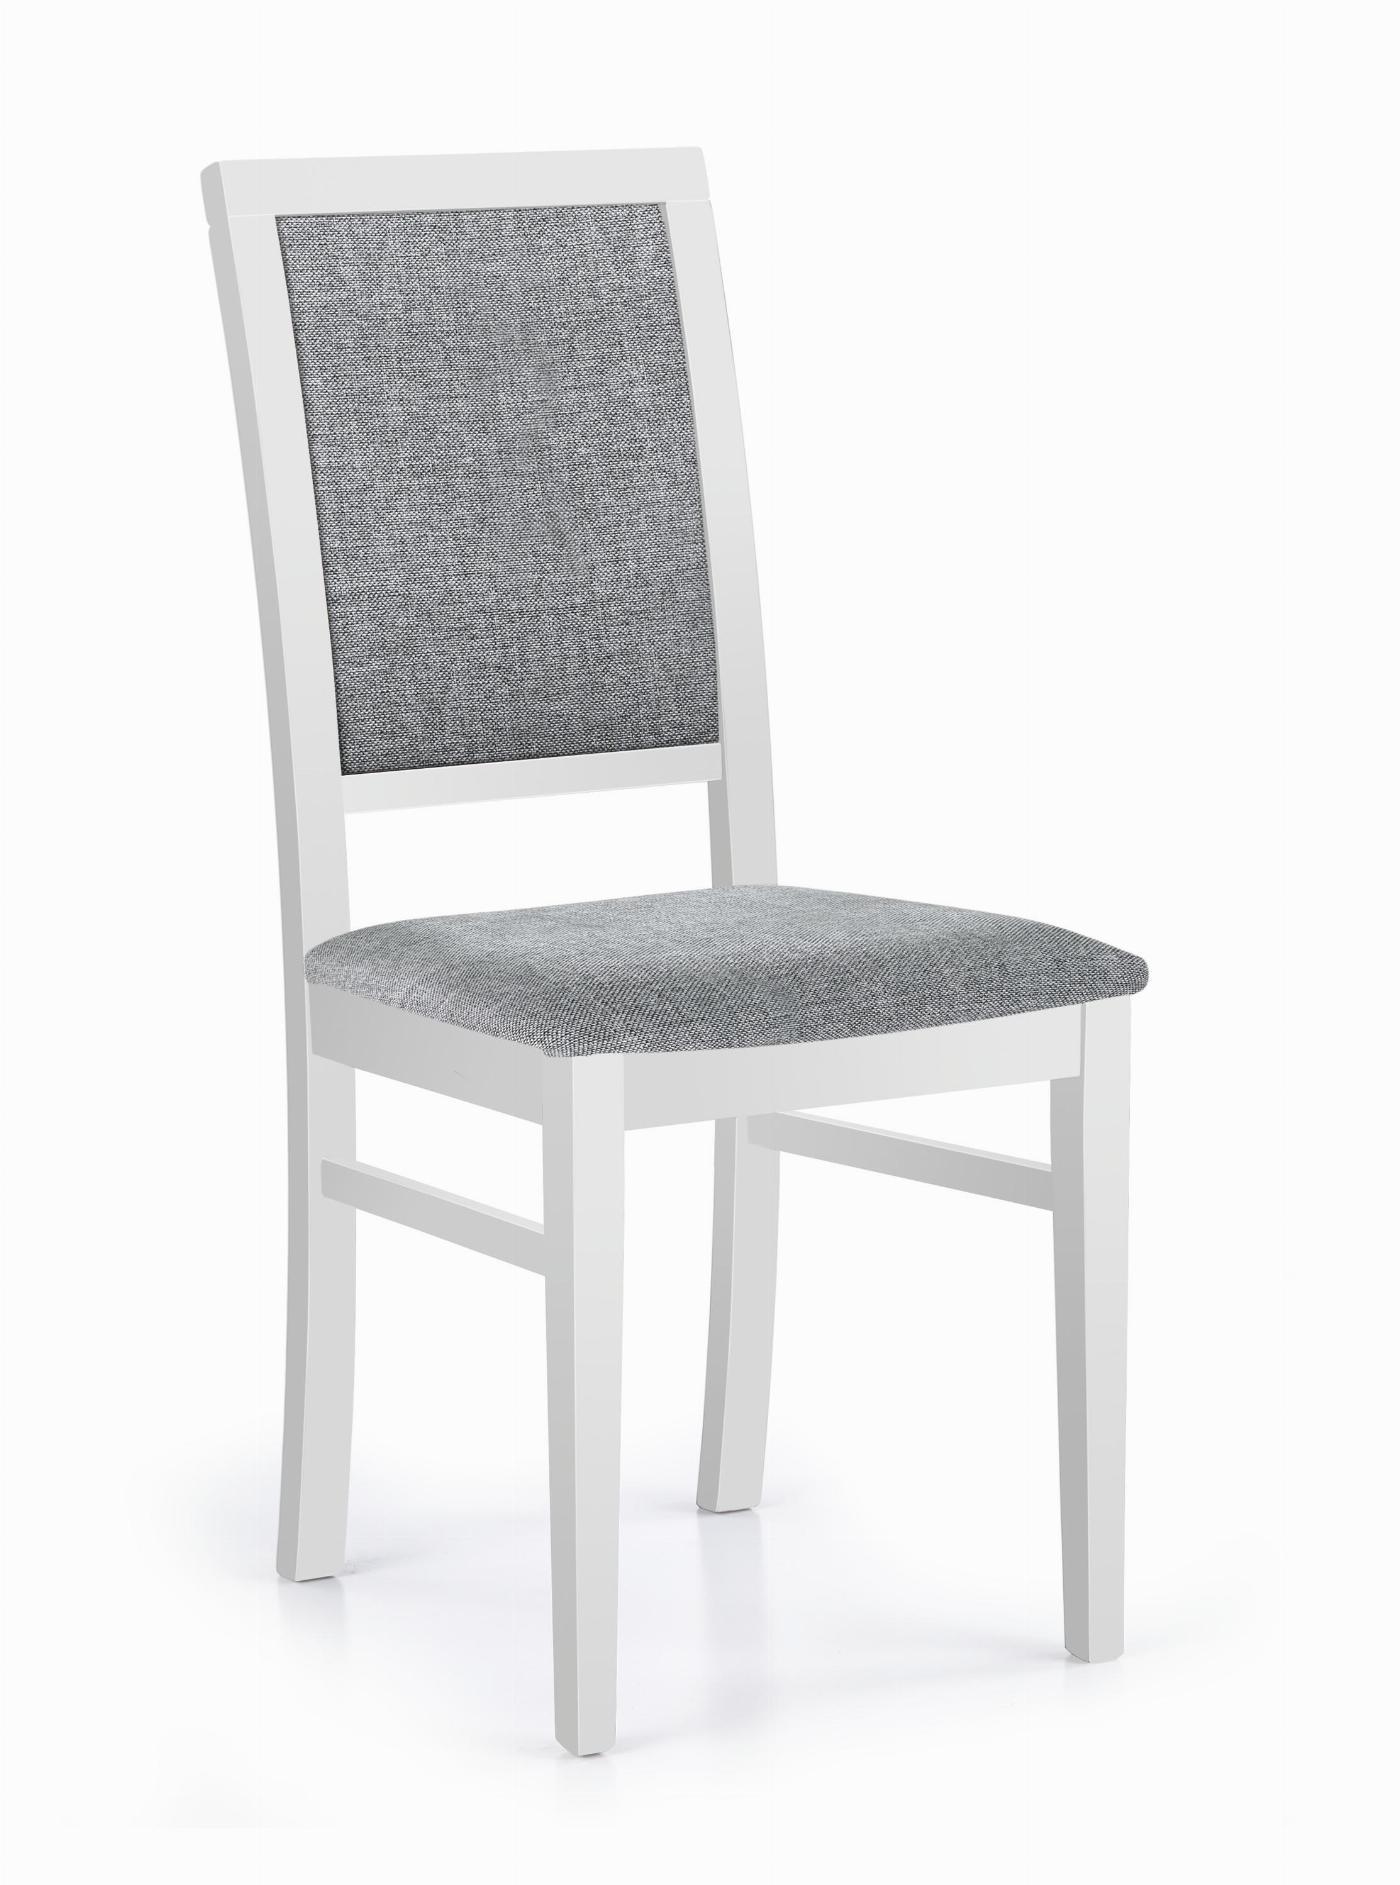 SYLWEK1 krzesło biały / tap: Inari 91 (1p=2szt)